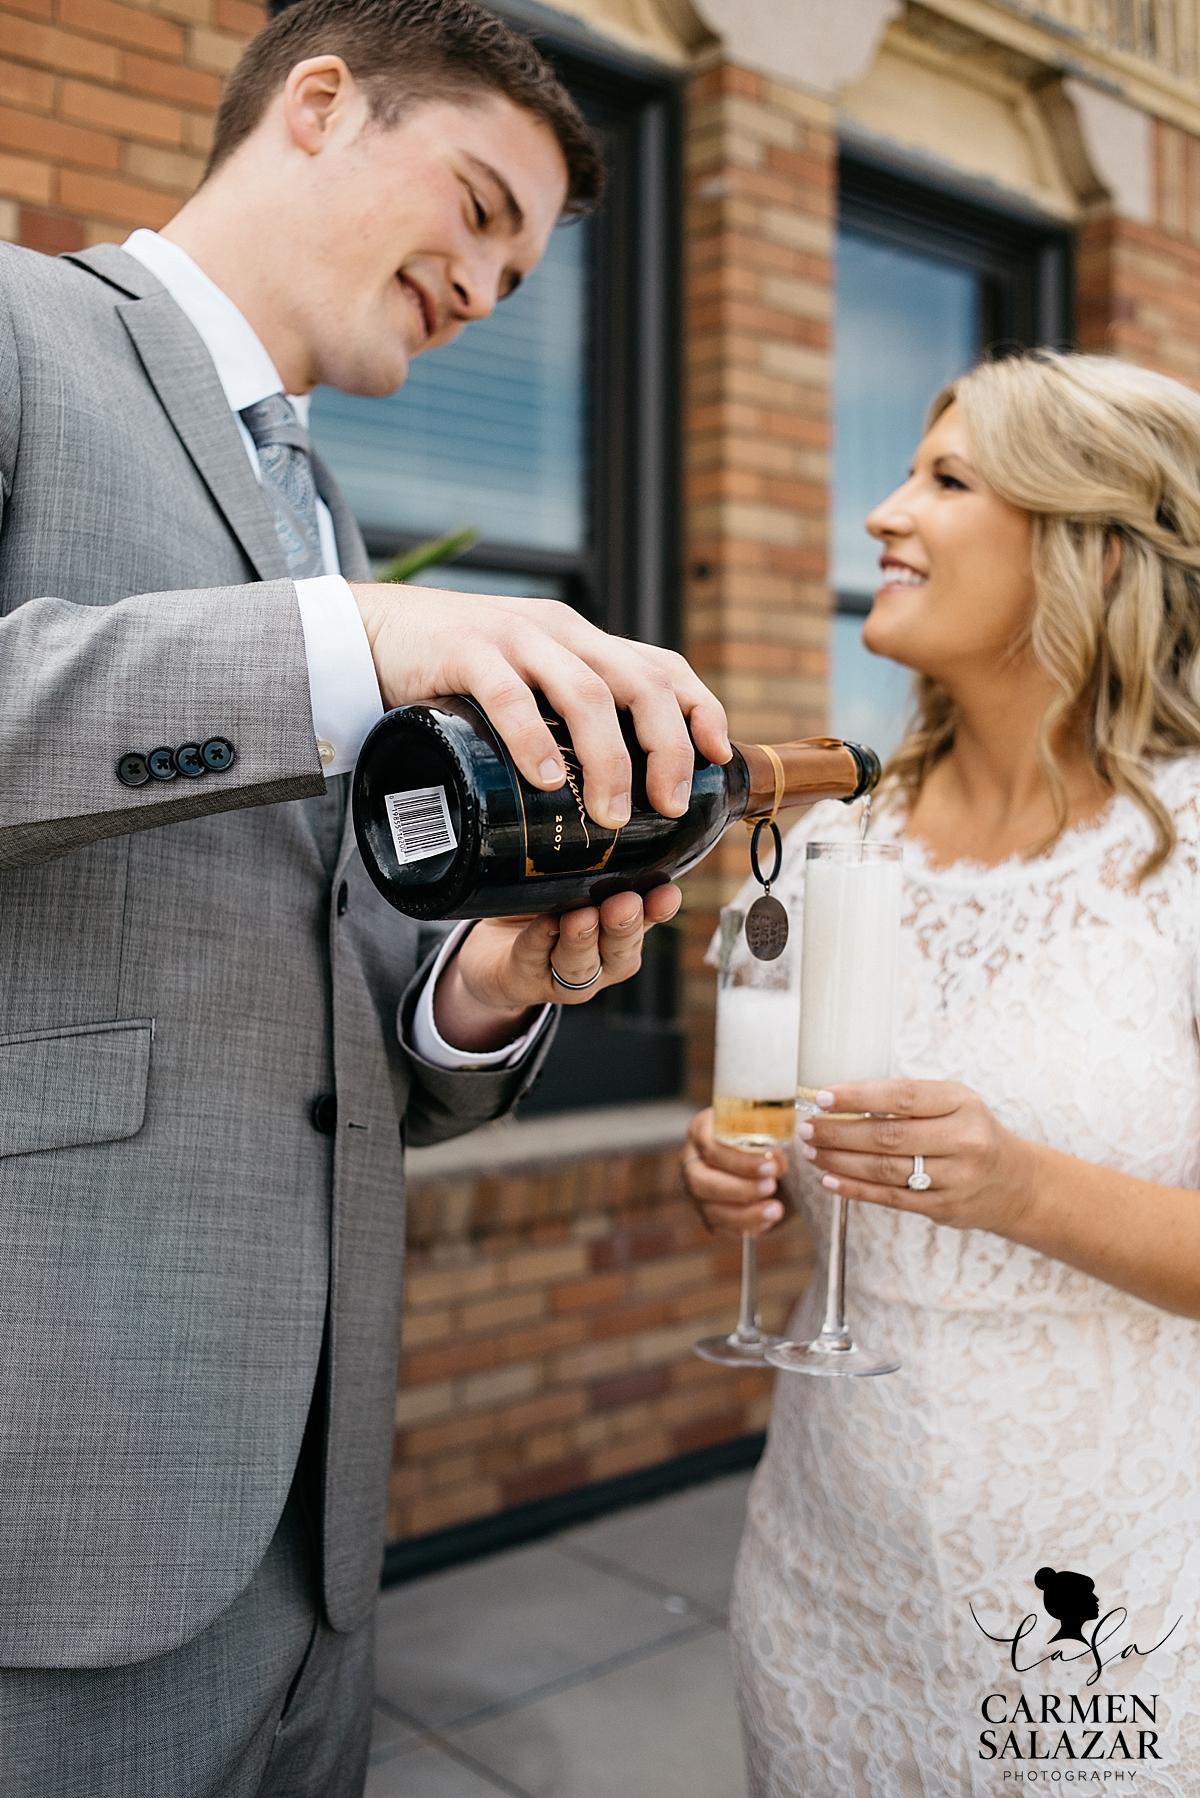 Citizen Hotel champagne toast - Carmen Salazar